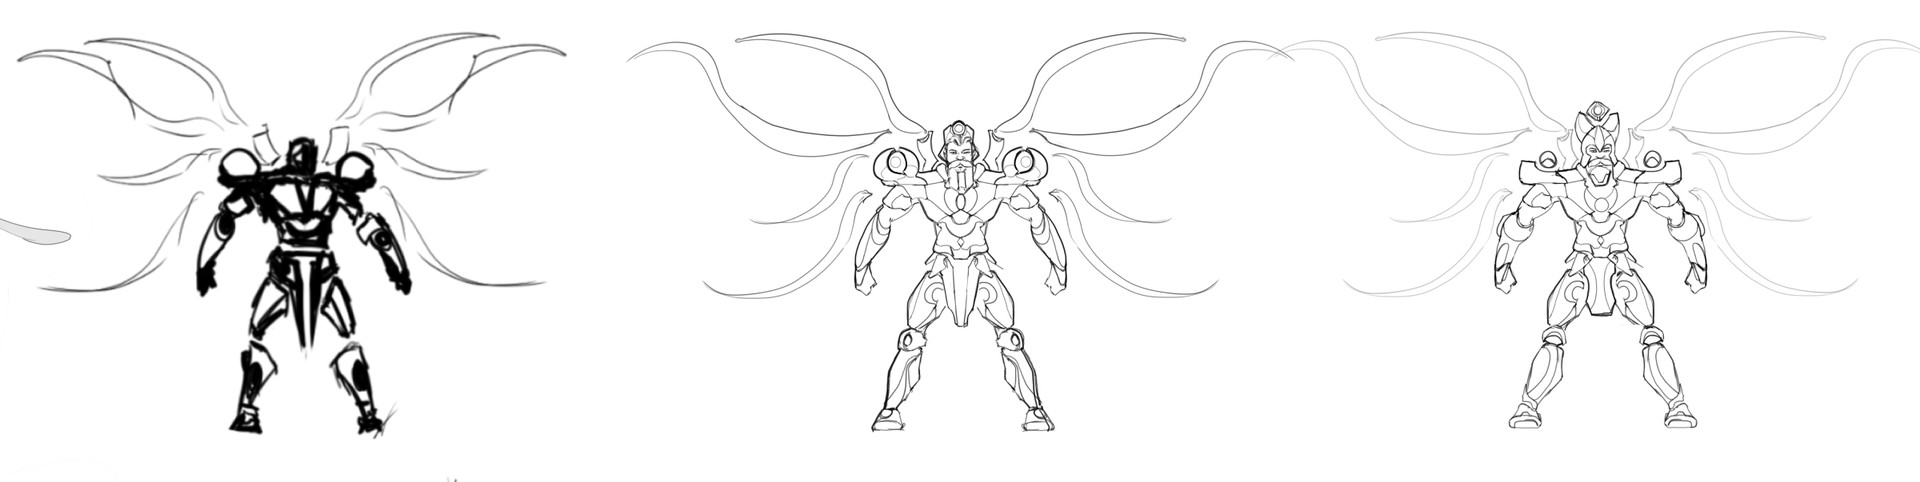 Danny kundzinsh art war archangel concept wip4